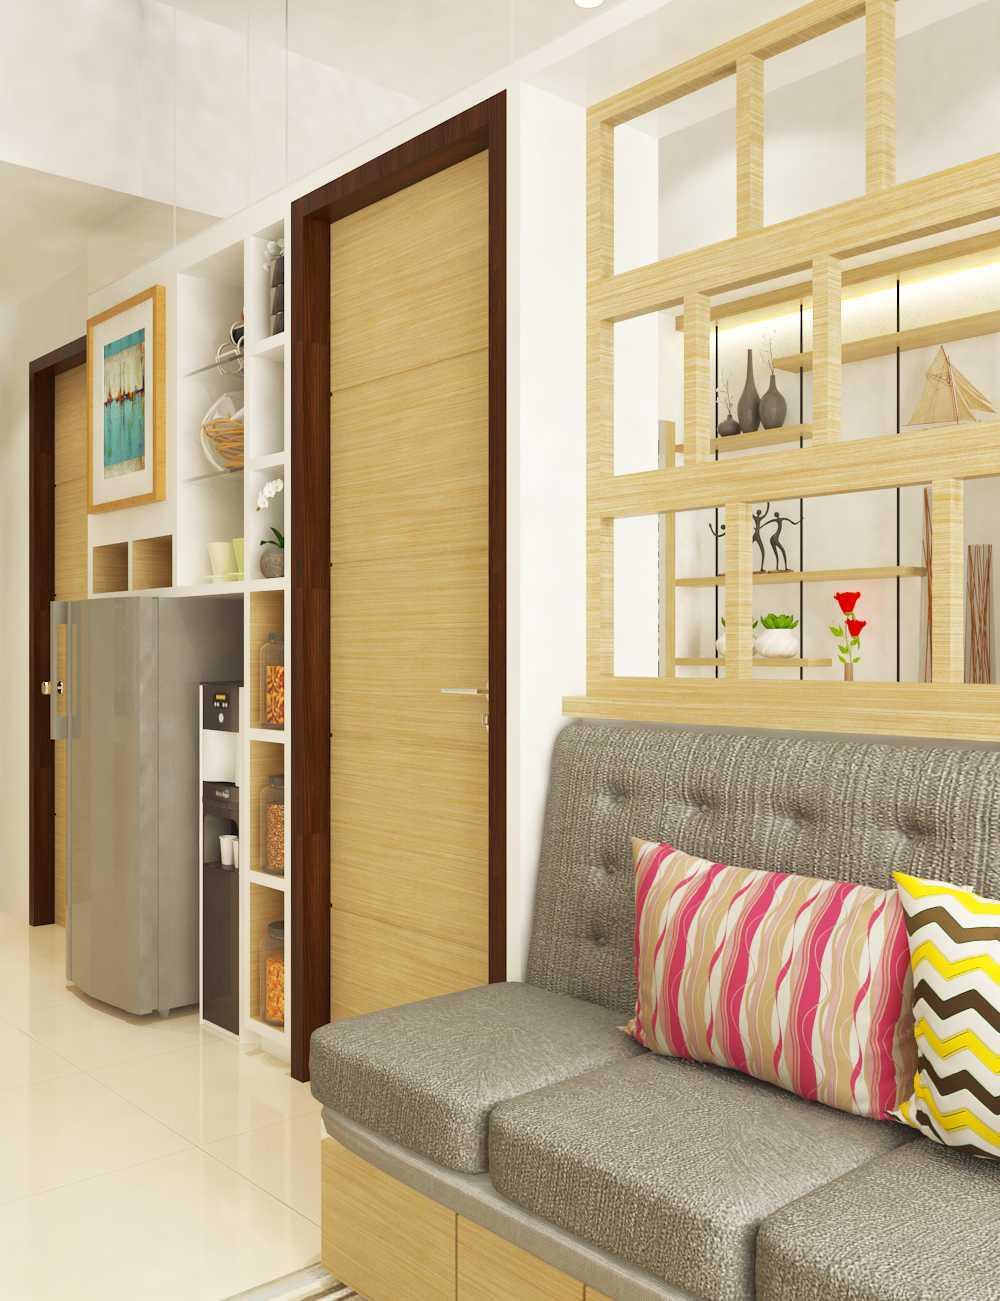 Miv Architects (Ar. Muhammad Ikhsan Hamiru, Iai & Partners) Interior Design Of Apartment Unit Makassar, South Sulawesi, Indonesia Makassar, South Sulawesi, Indonesia Apartment Room Design Kontemporer  29129